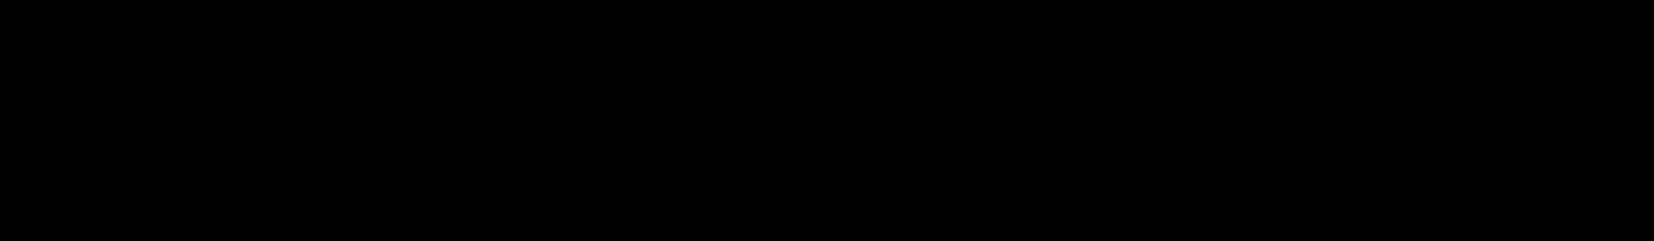 Museo 900 Italic